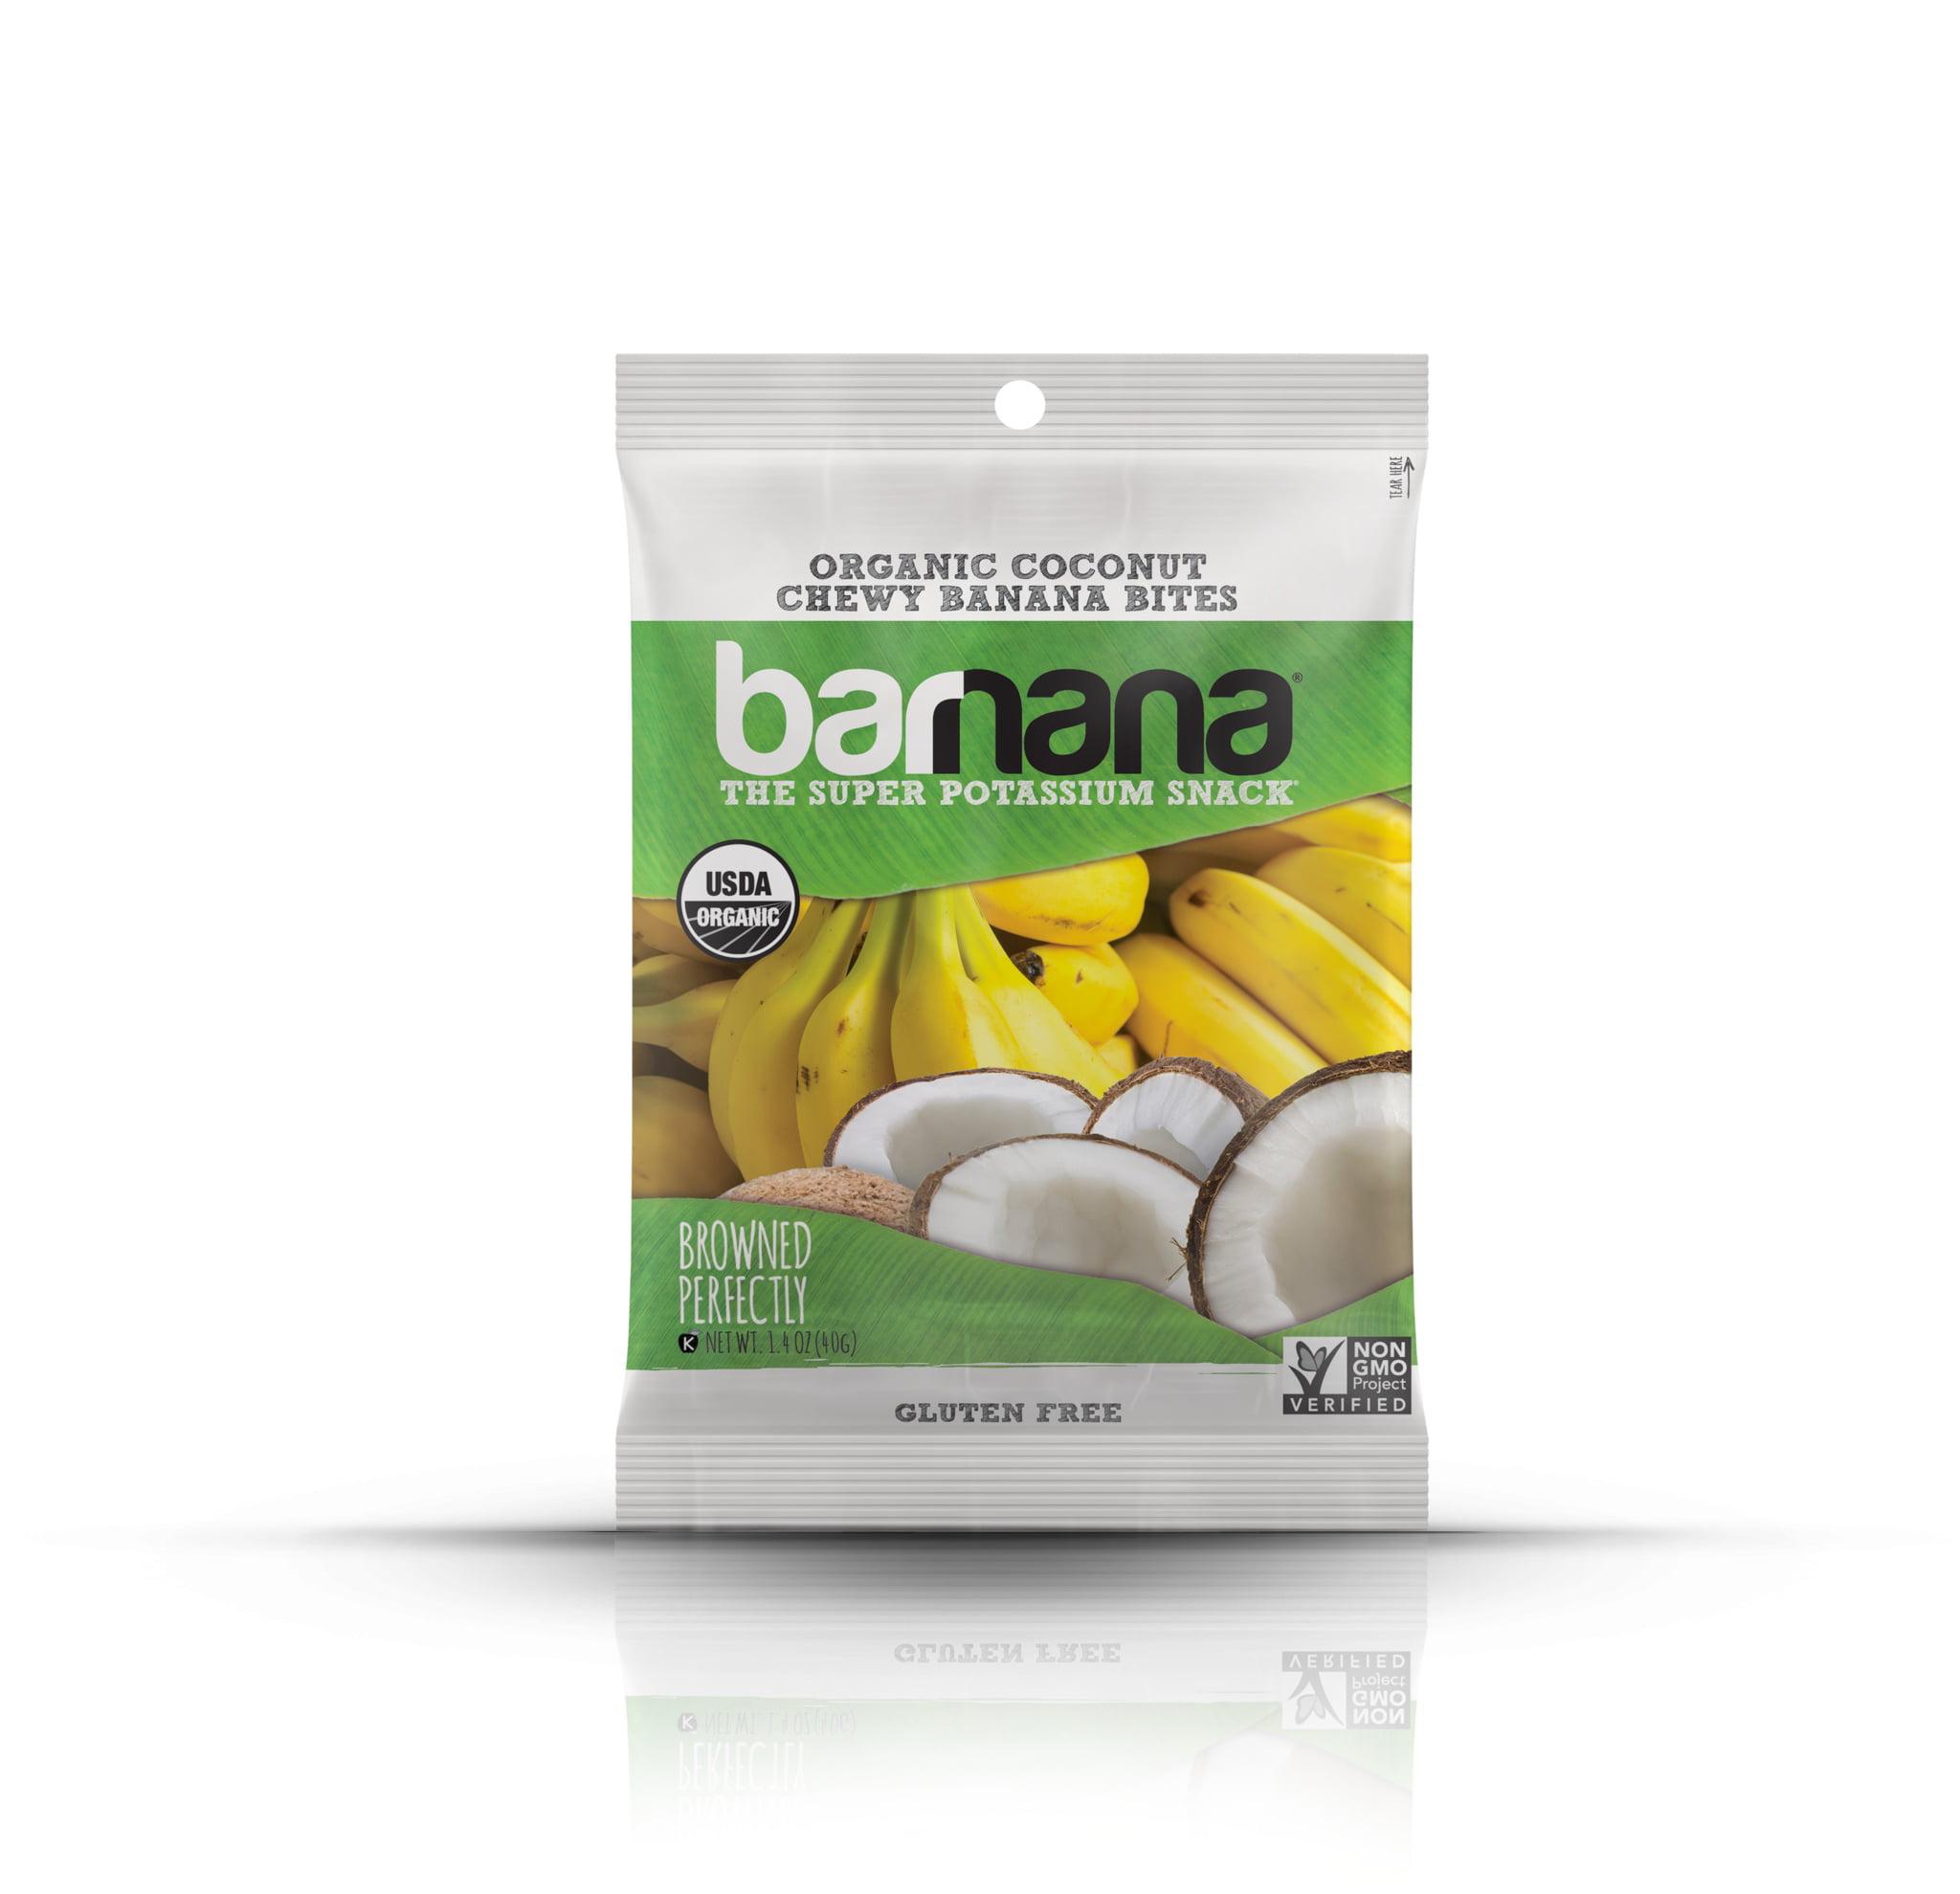 Barnana Organic Chewy Banana Bites, Coconut, 1.4 Ounce, 12 Count by